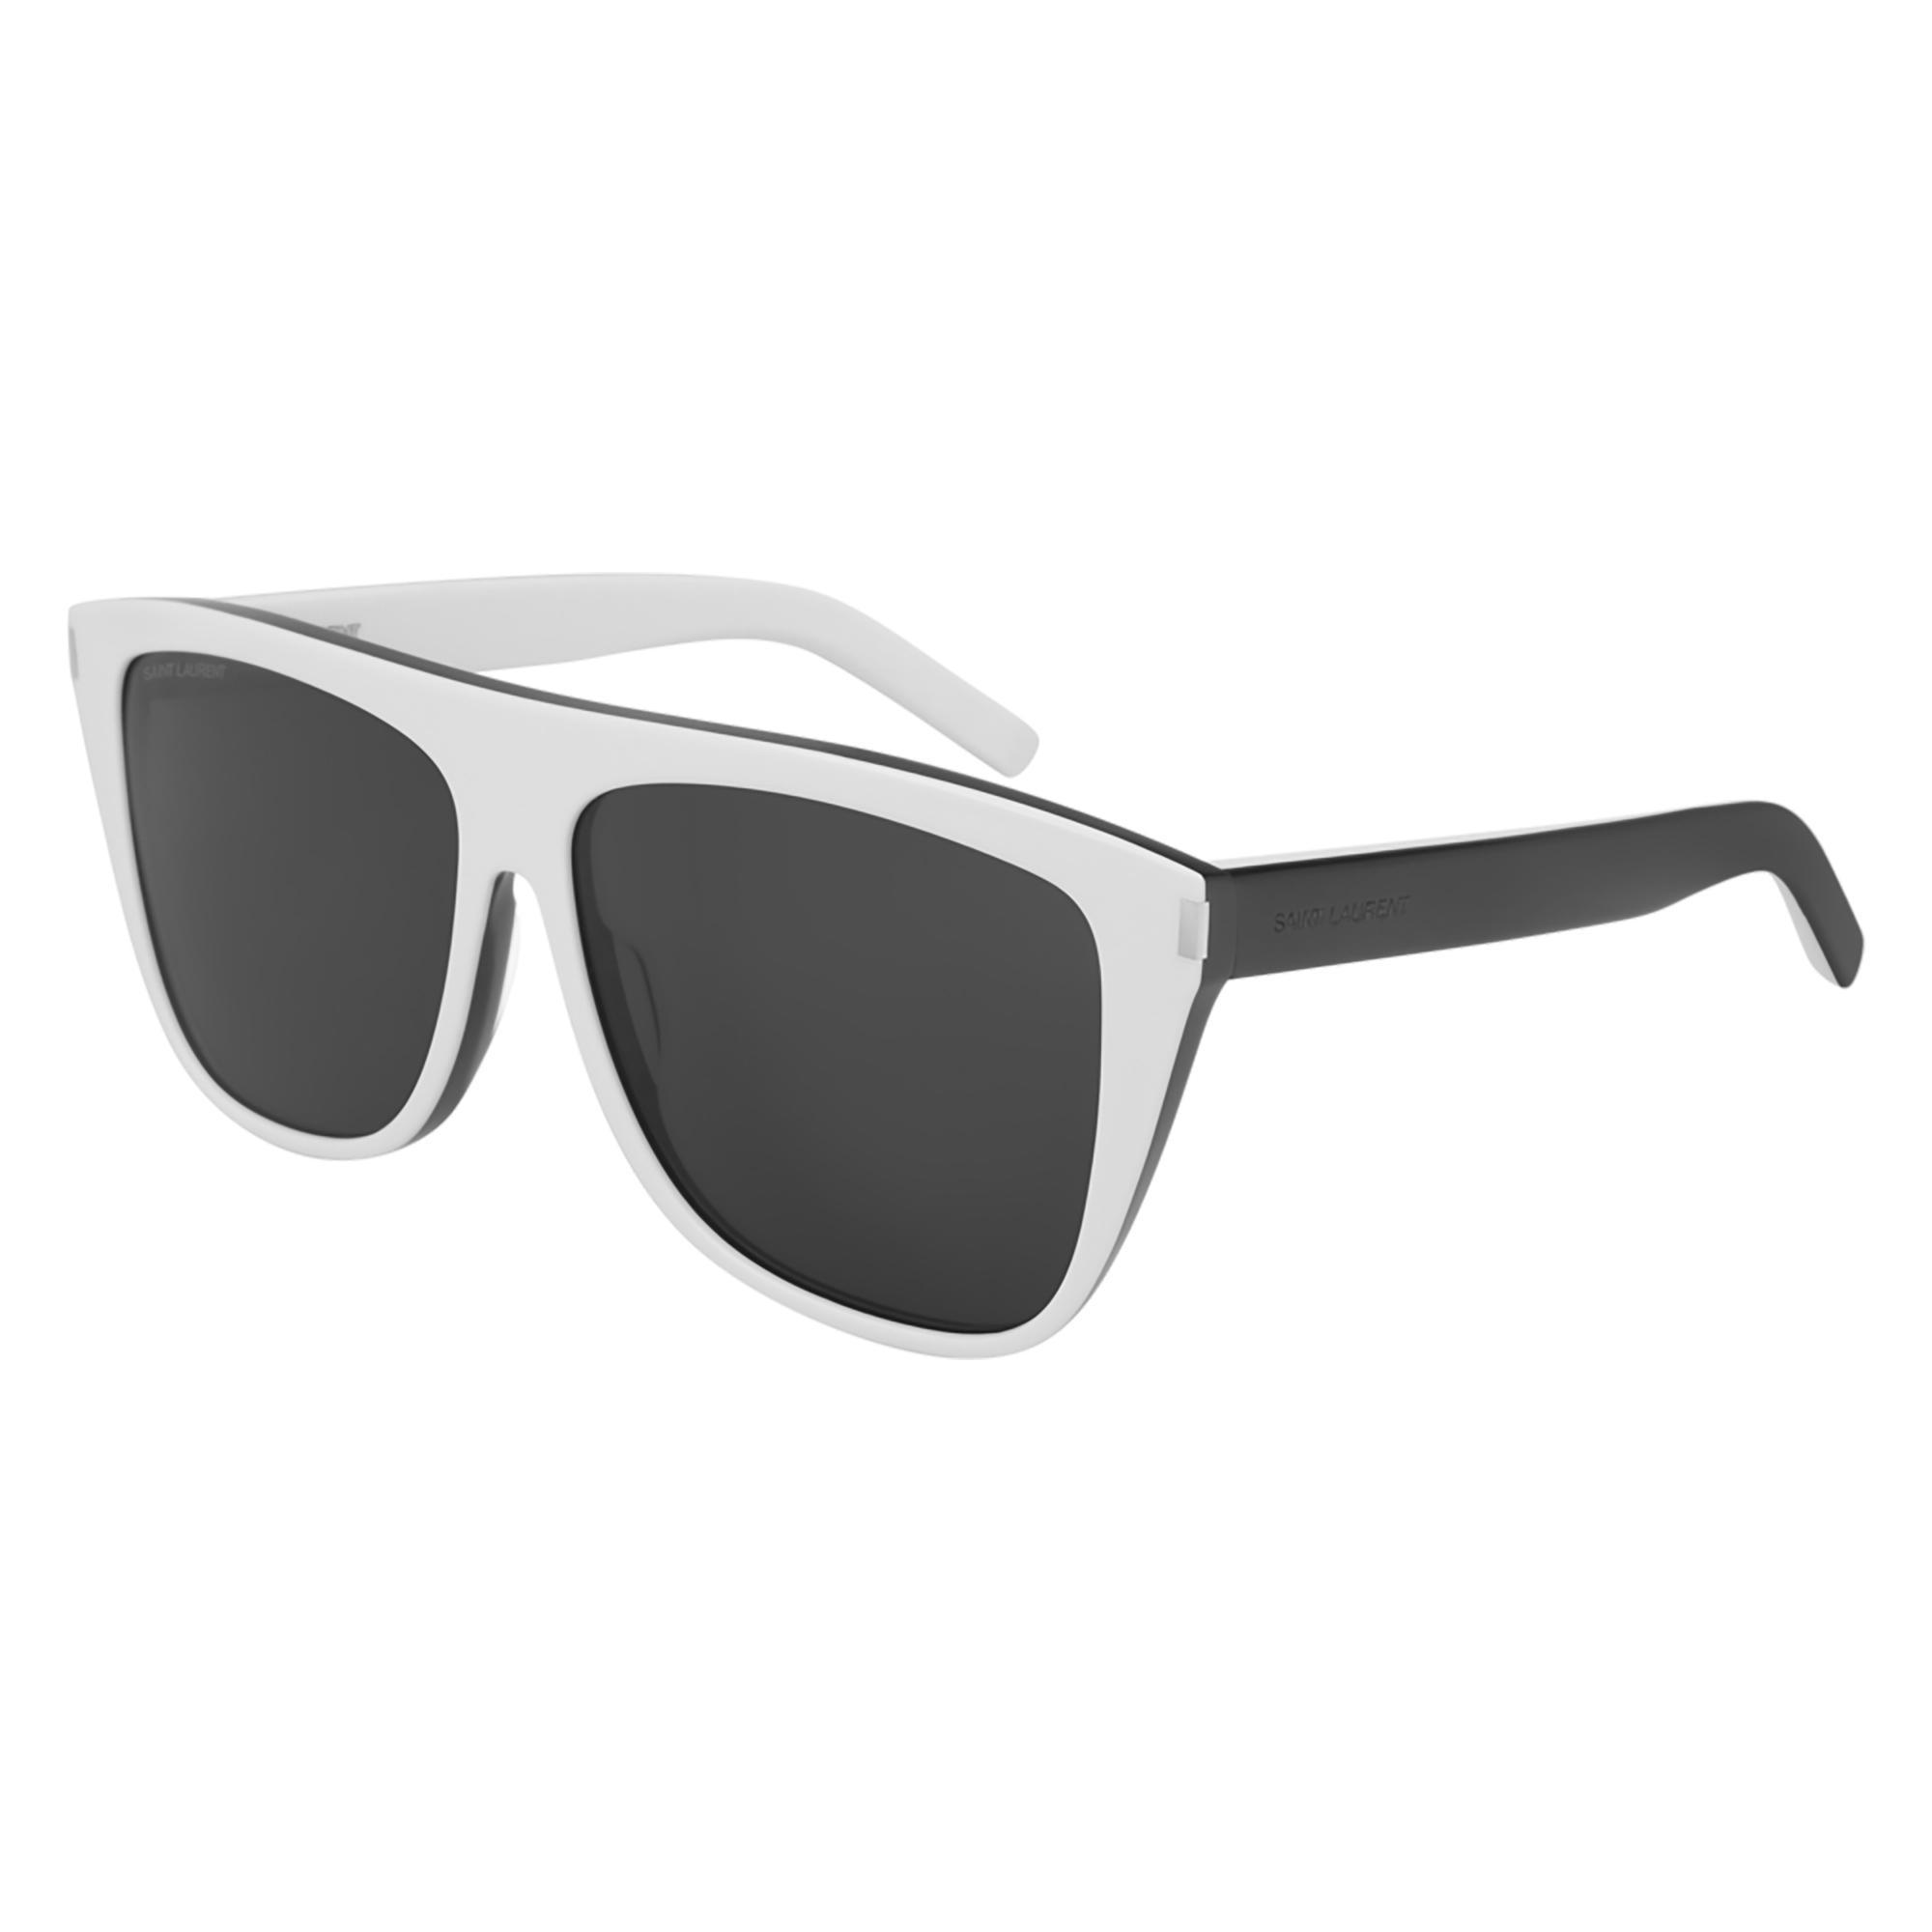 020 white black grey